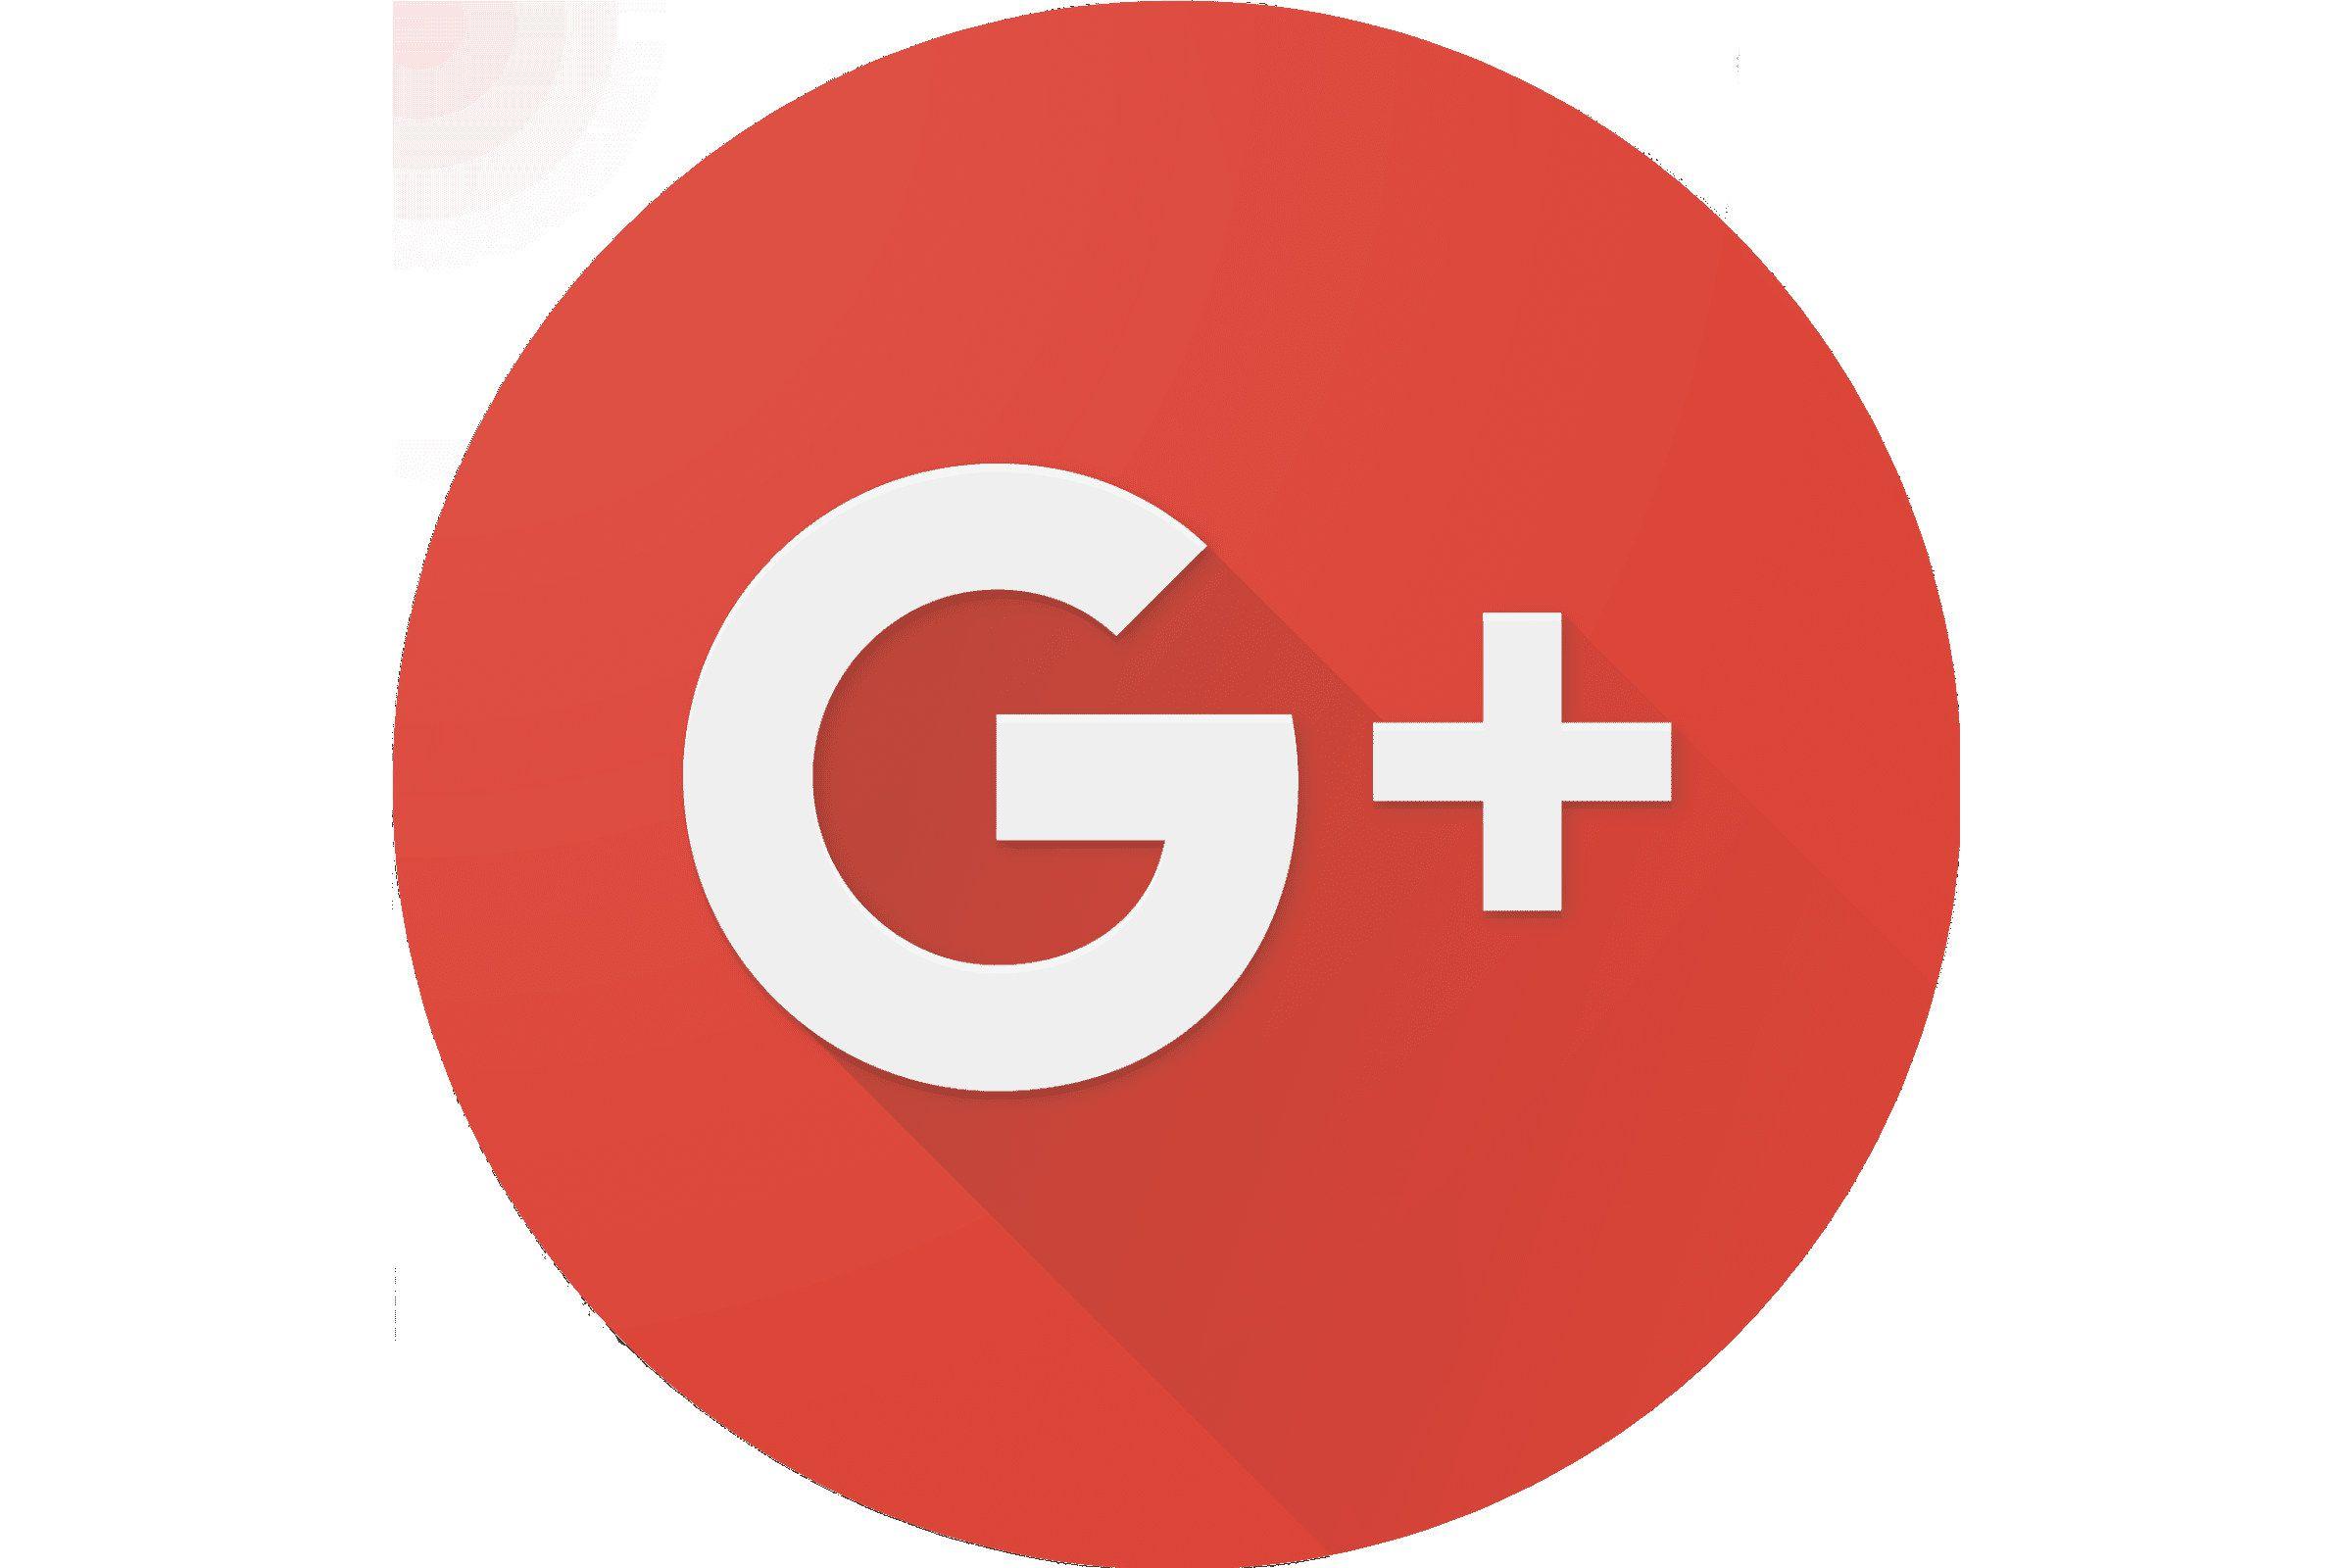 circl.es dating app Gratis dating Brecon